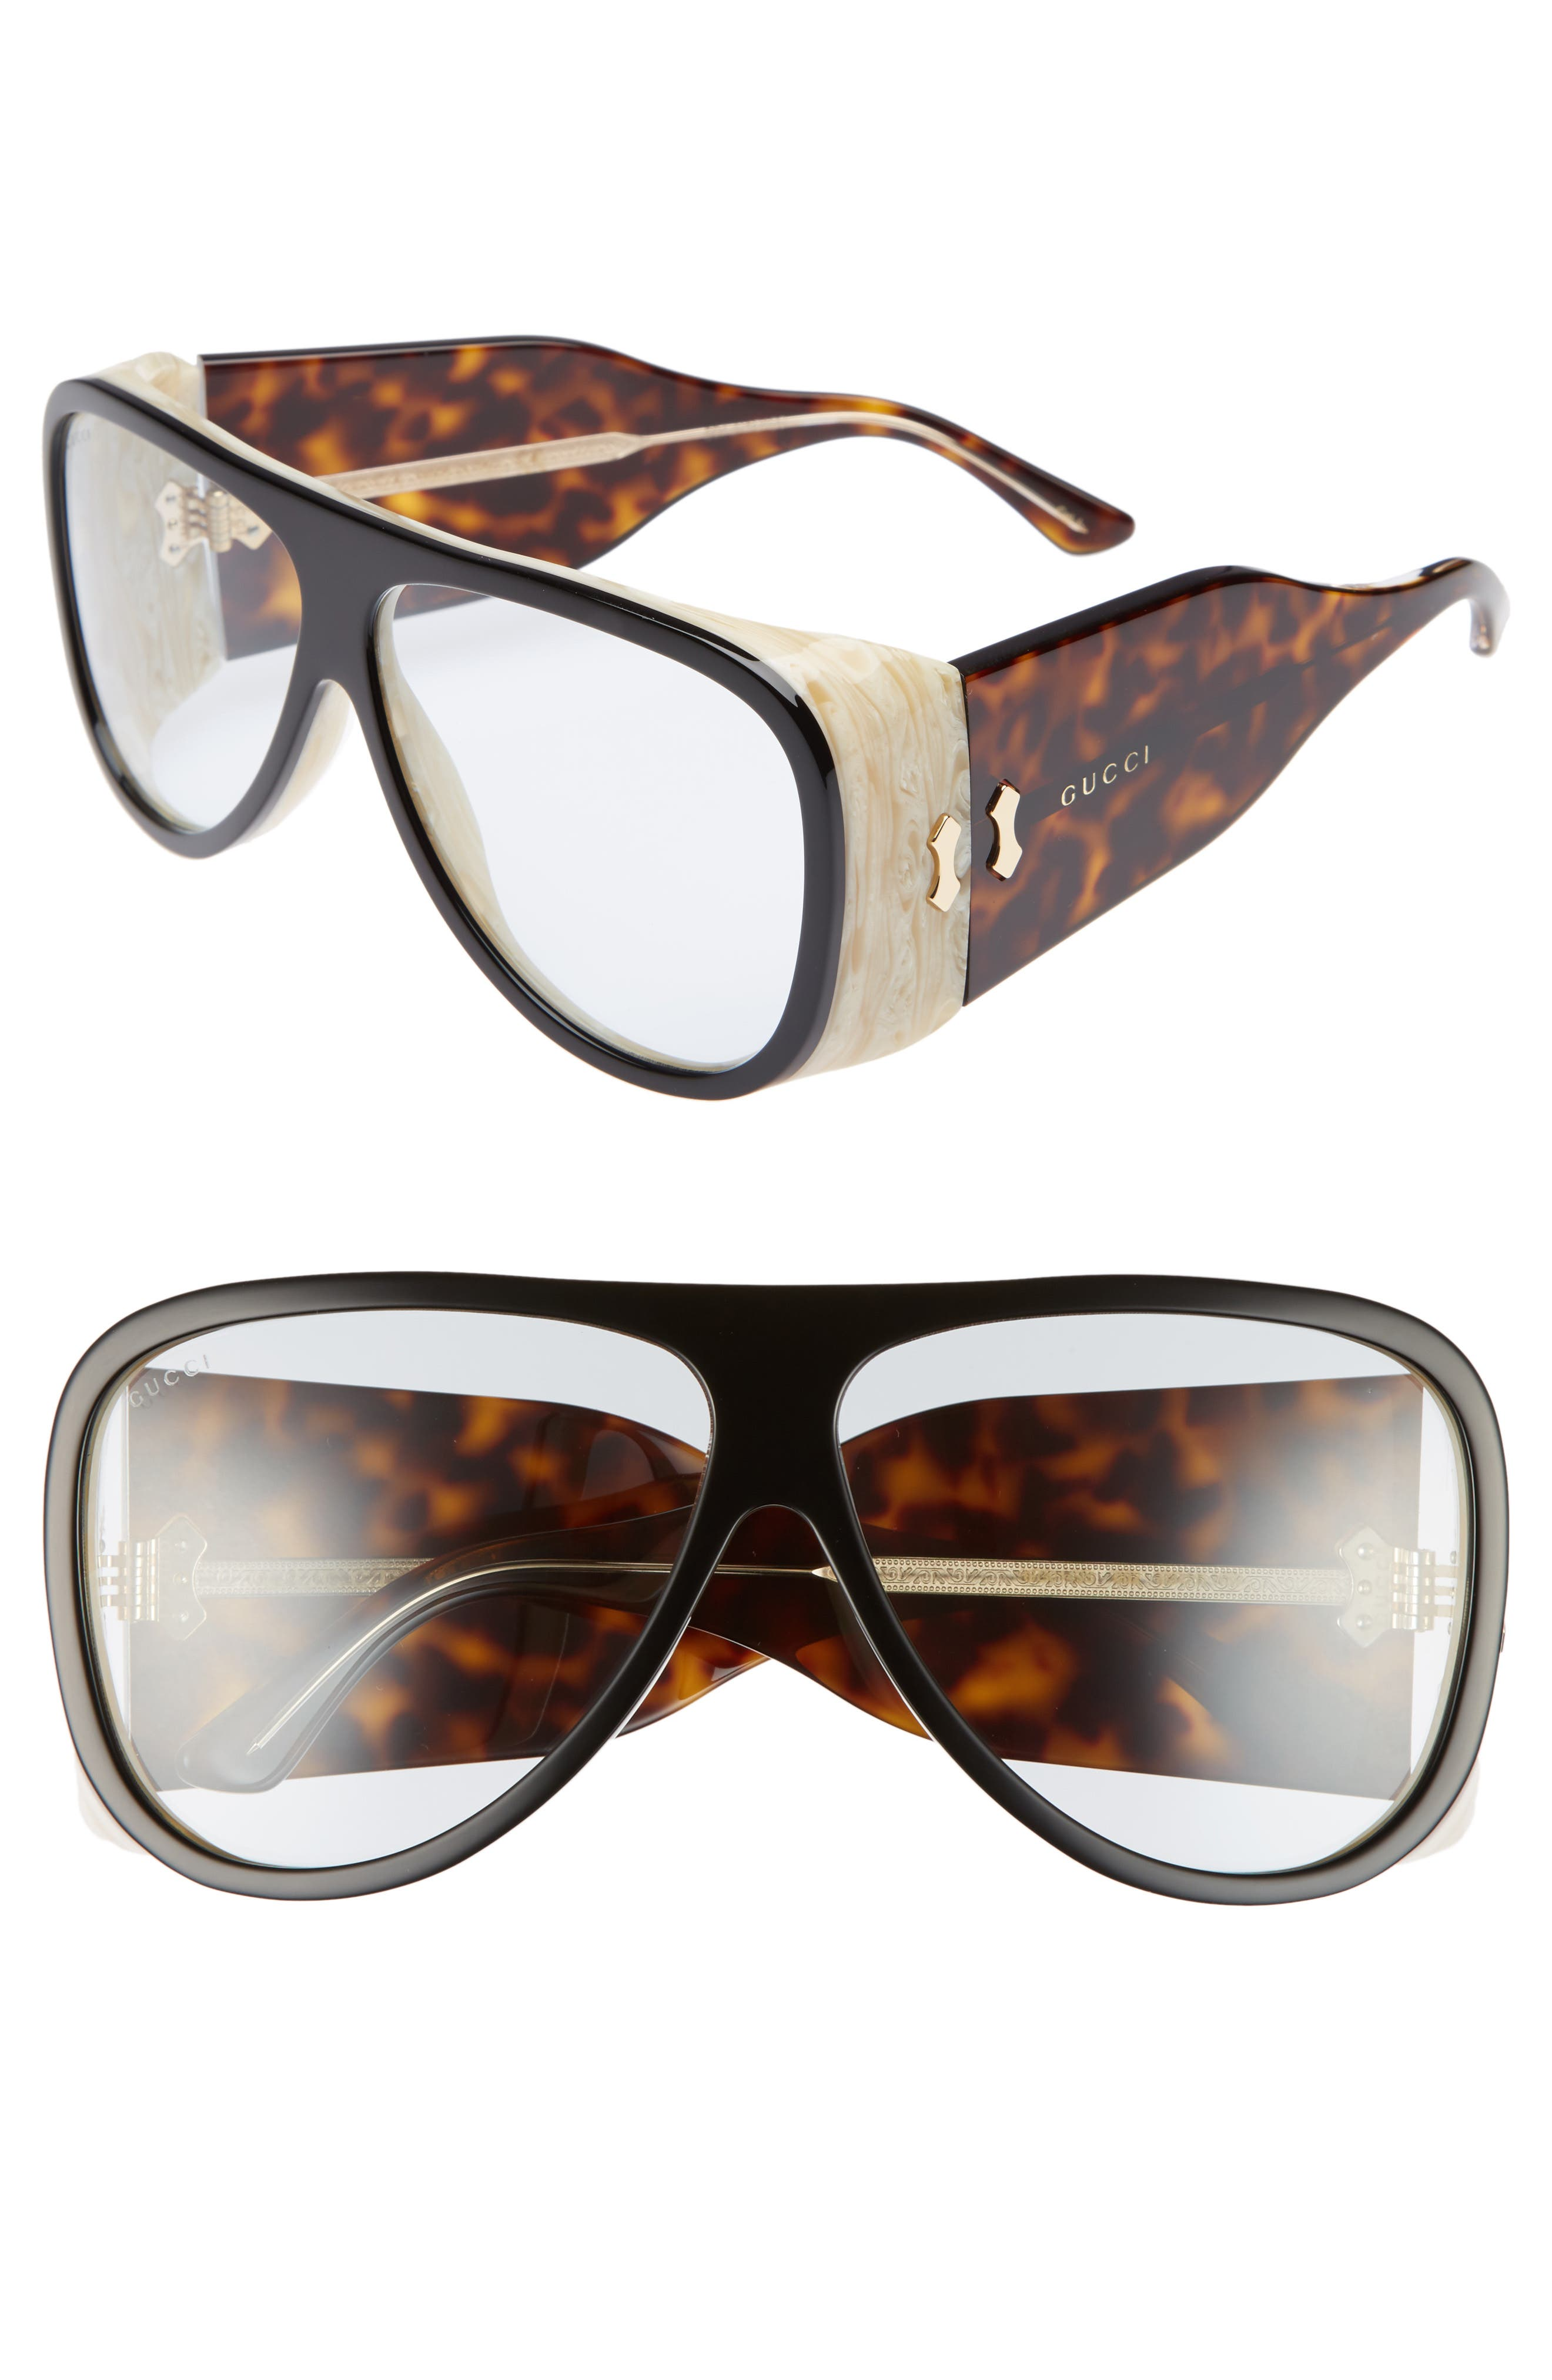 63mm Oversize Aviator Sunglasses,                         Main,                         color, Black